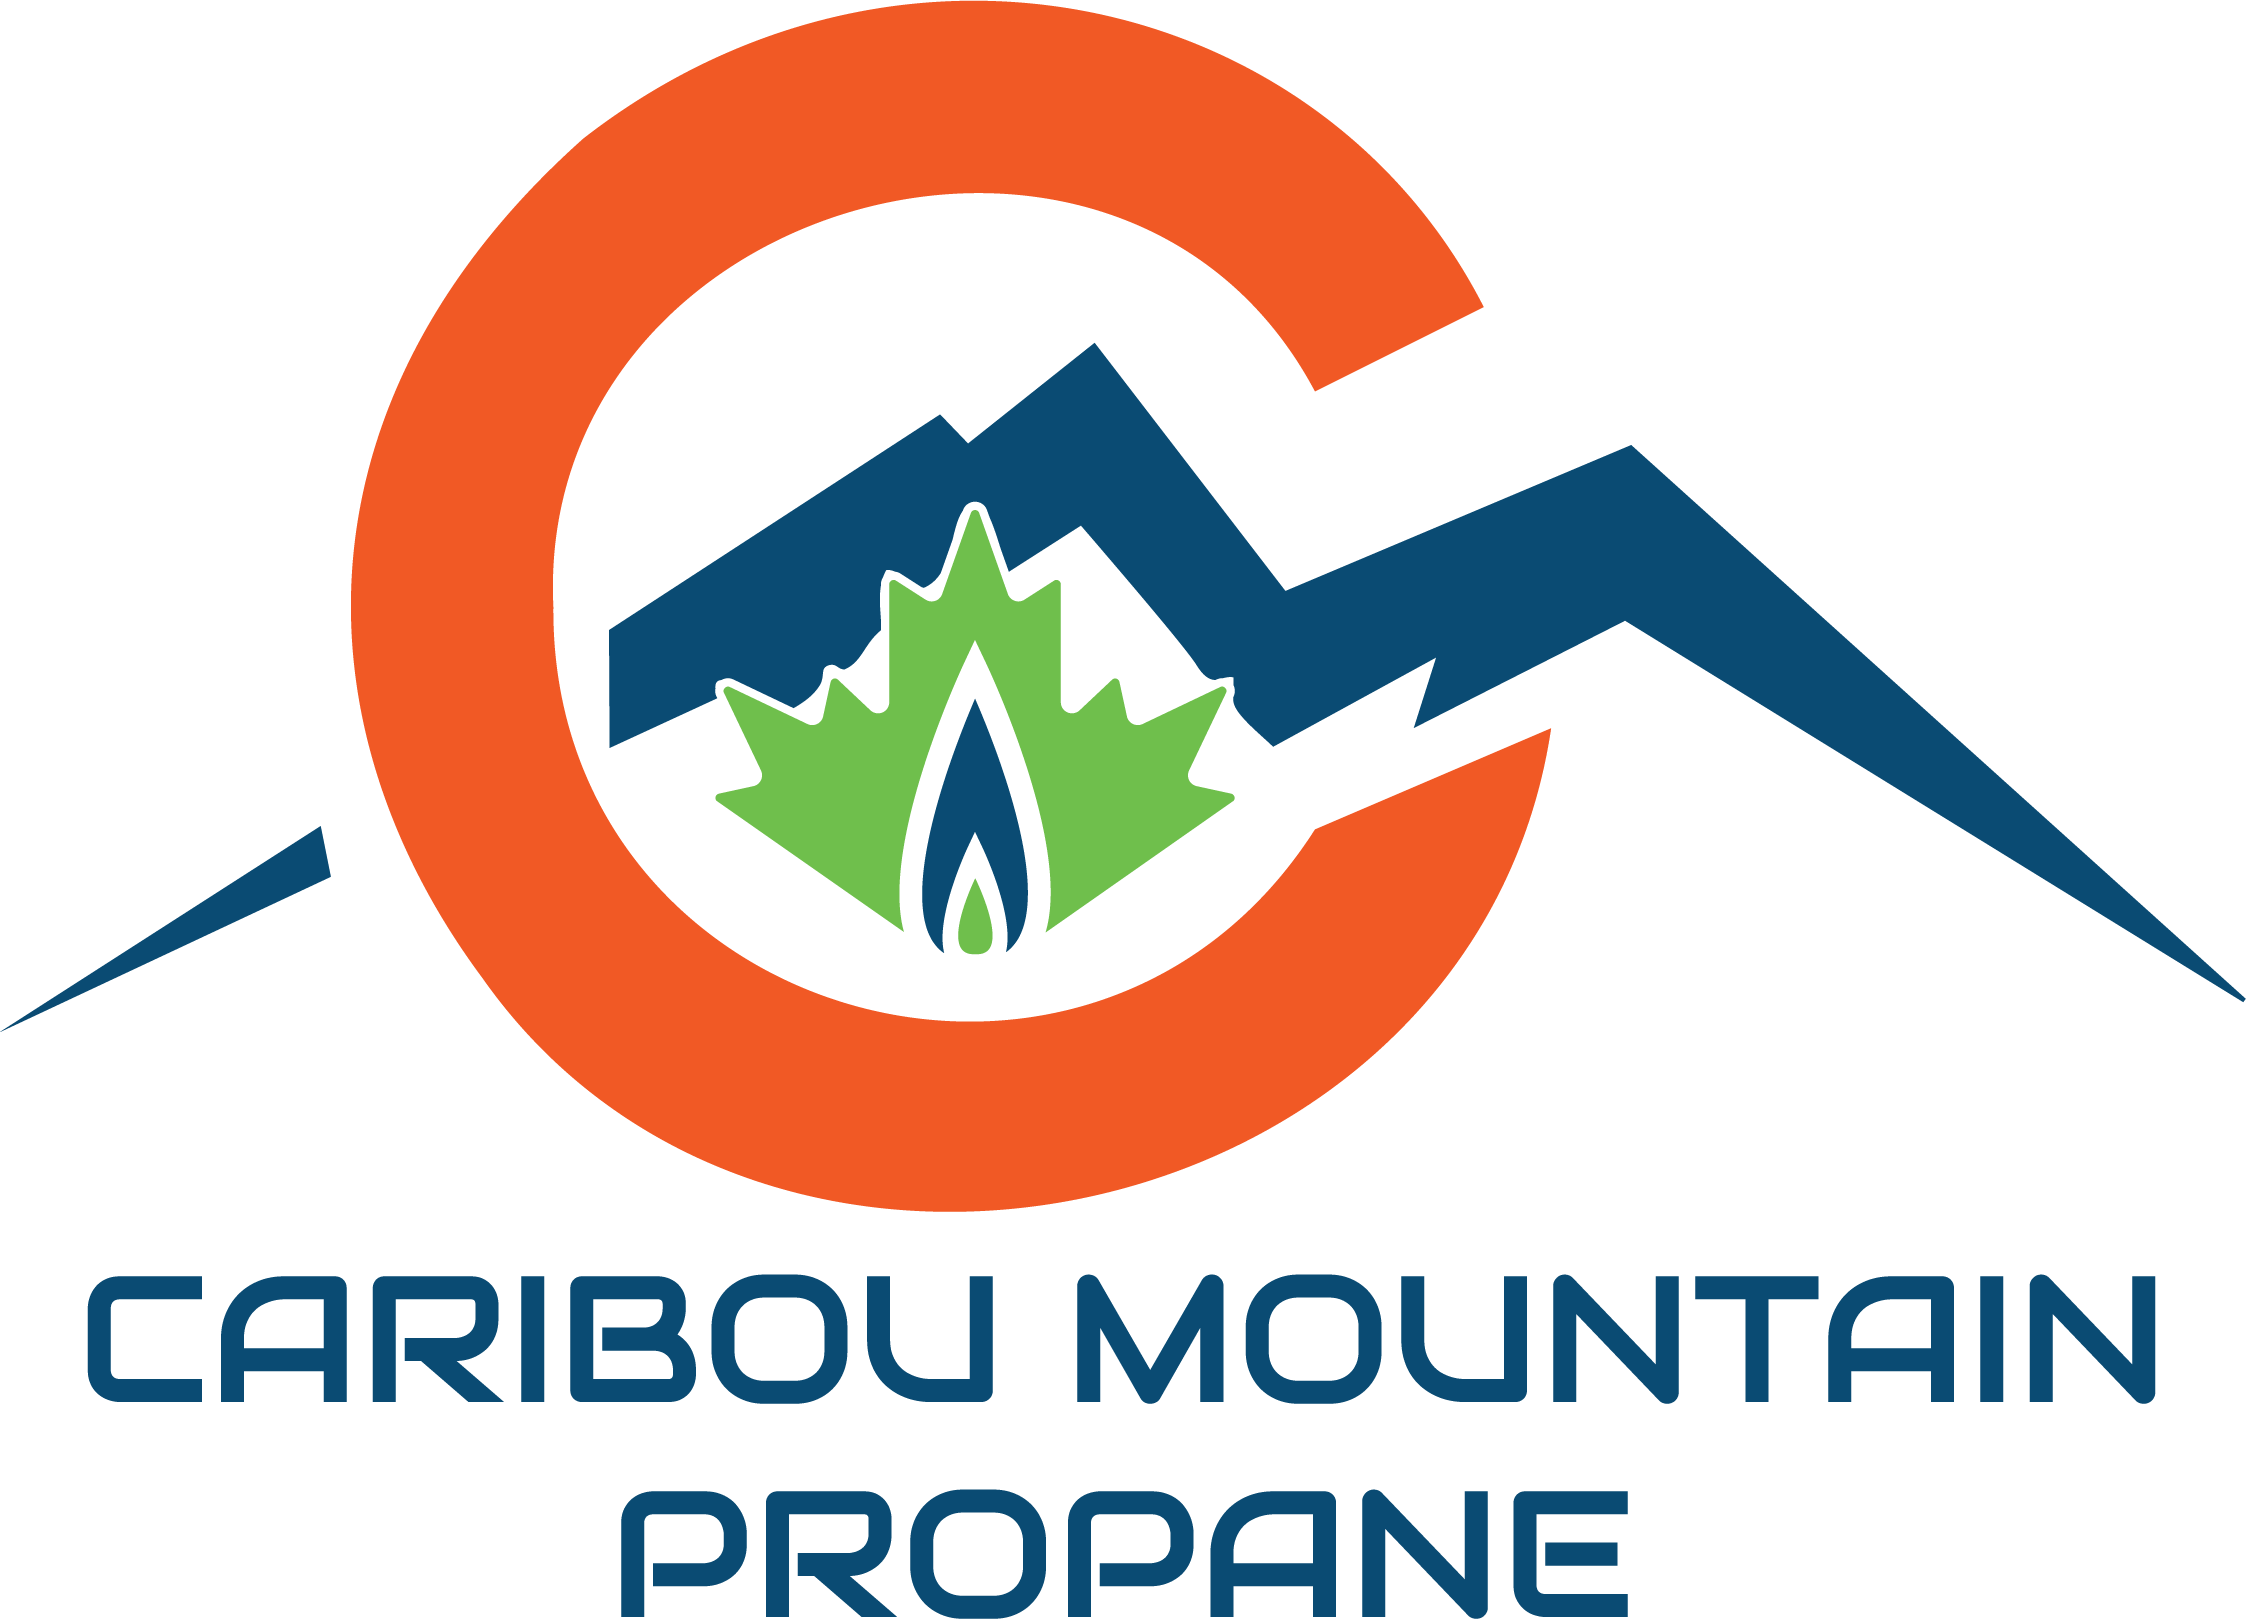 Caribou Mountain Propane